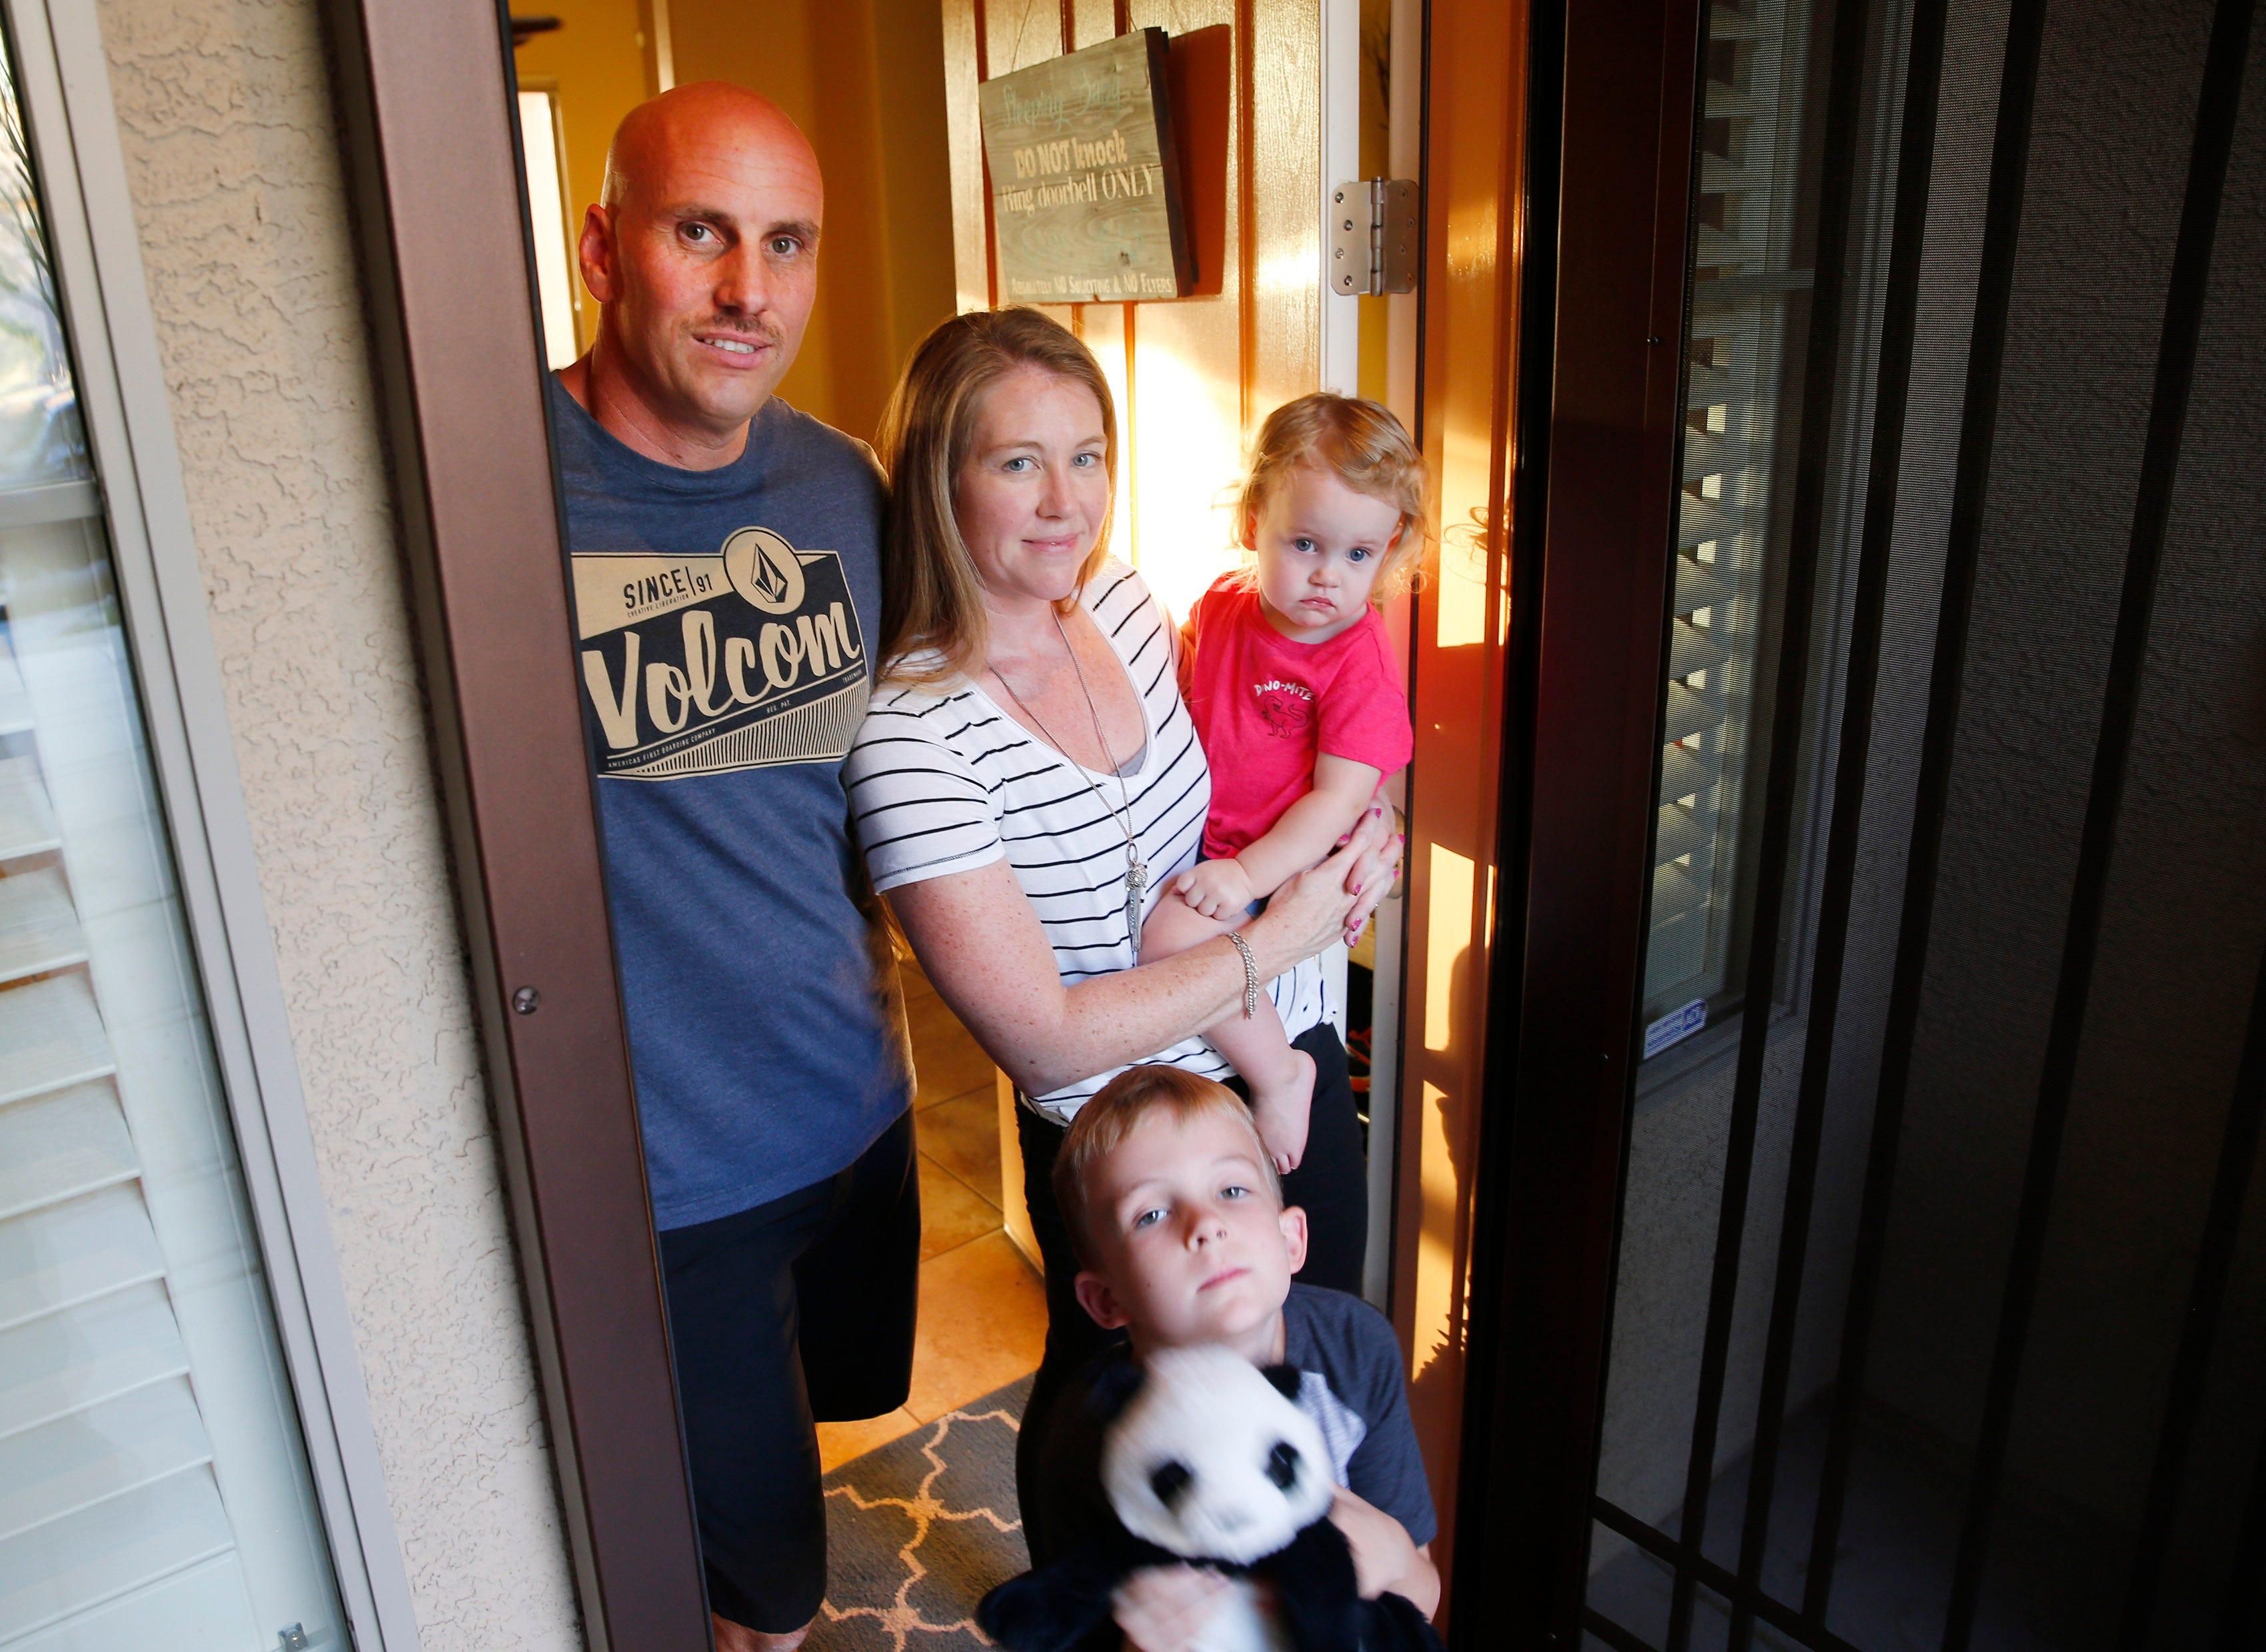 Phoenix-area families suffer in heat due to home-warranty company's fine print | AZ Central